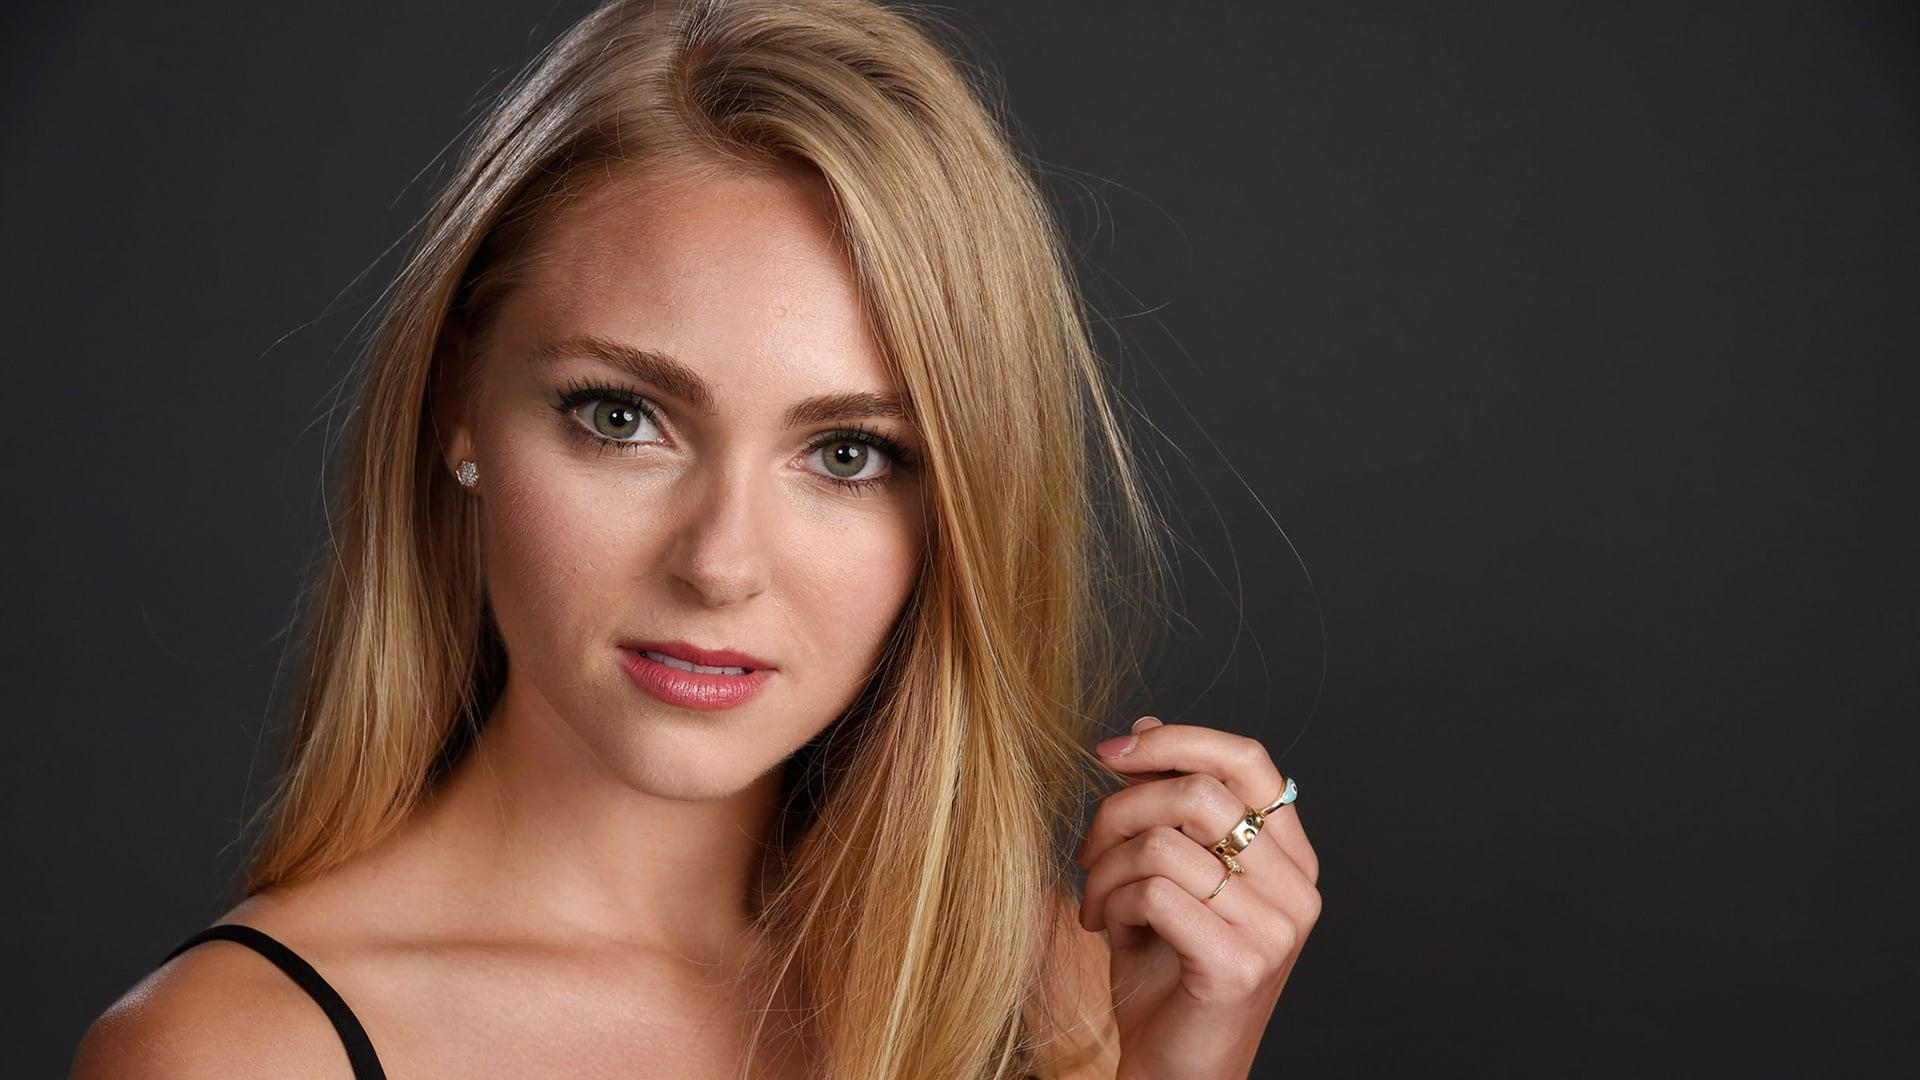 Celebrity Alyson Aly Michalka nude photos 2019